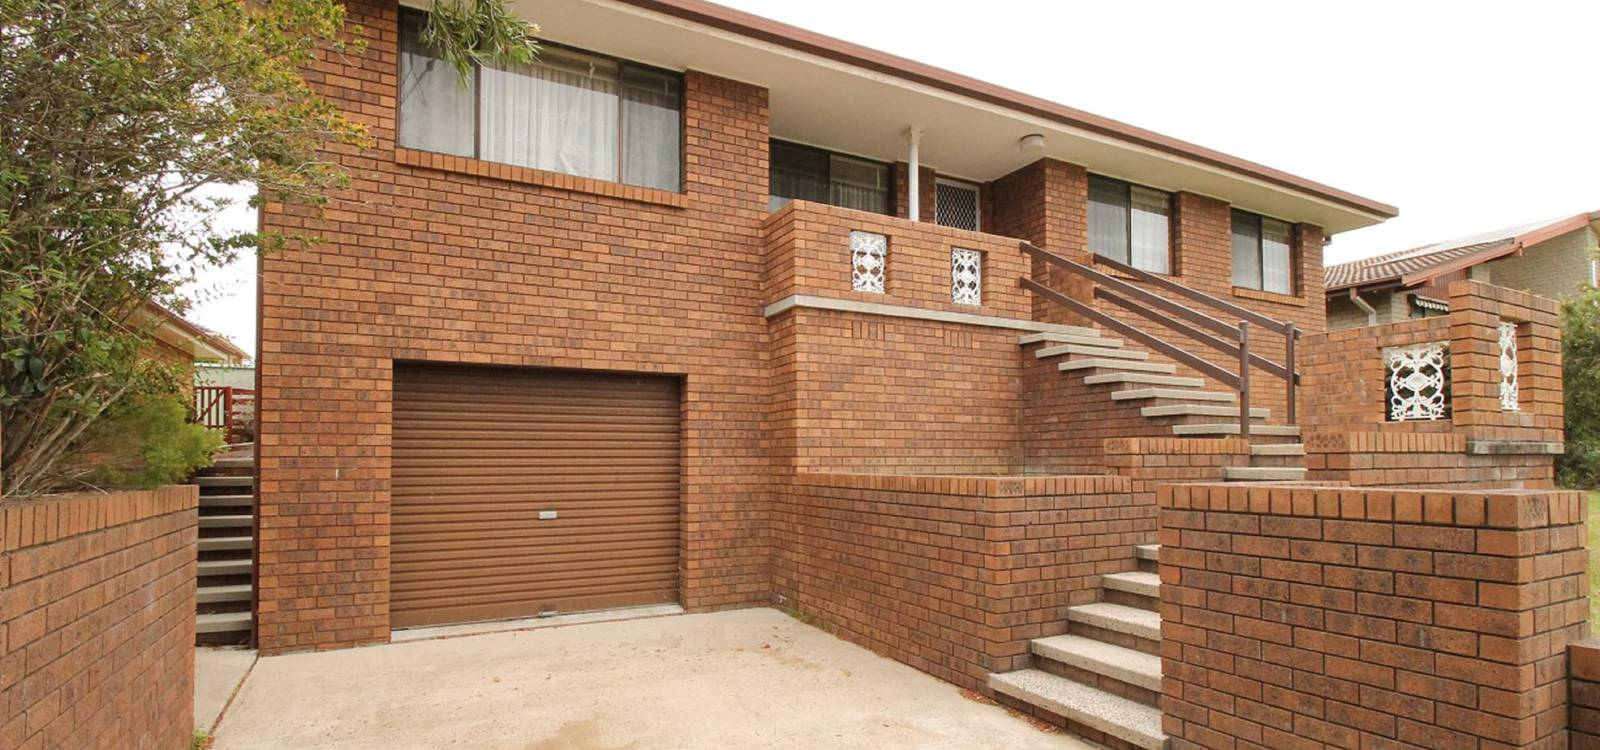 6 Pleasant Place TUROSS HEAD, NSW 2537 - photo 1